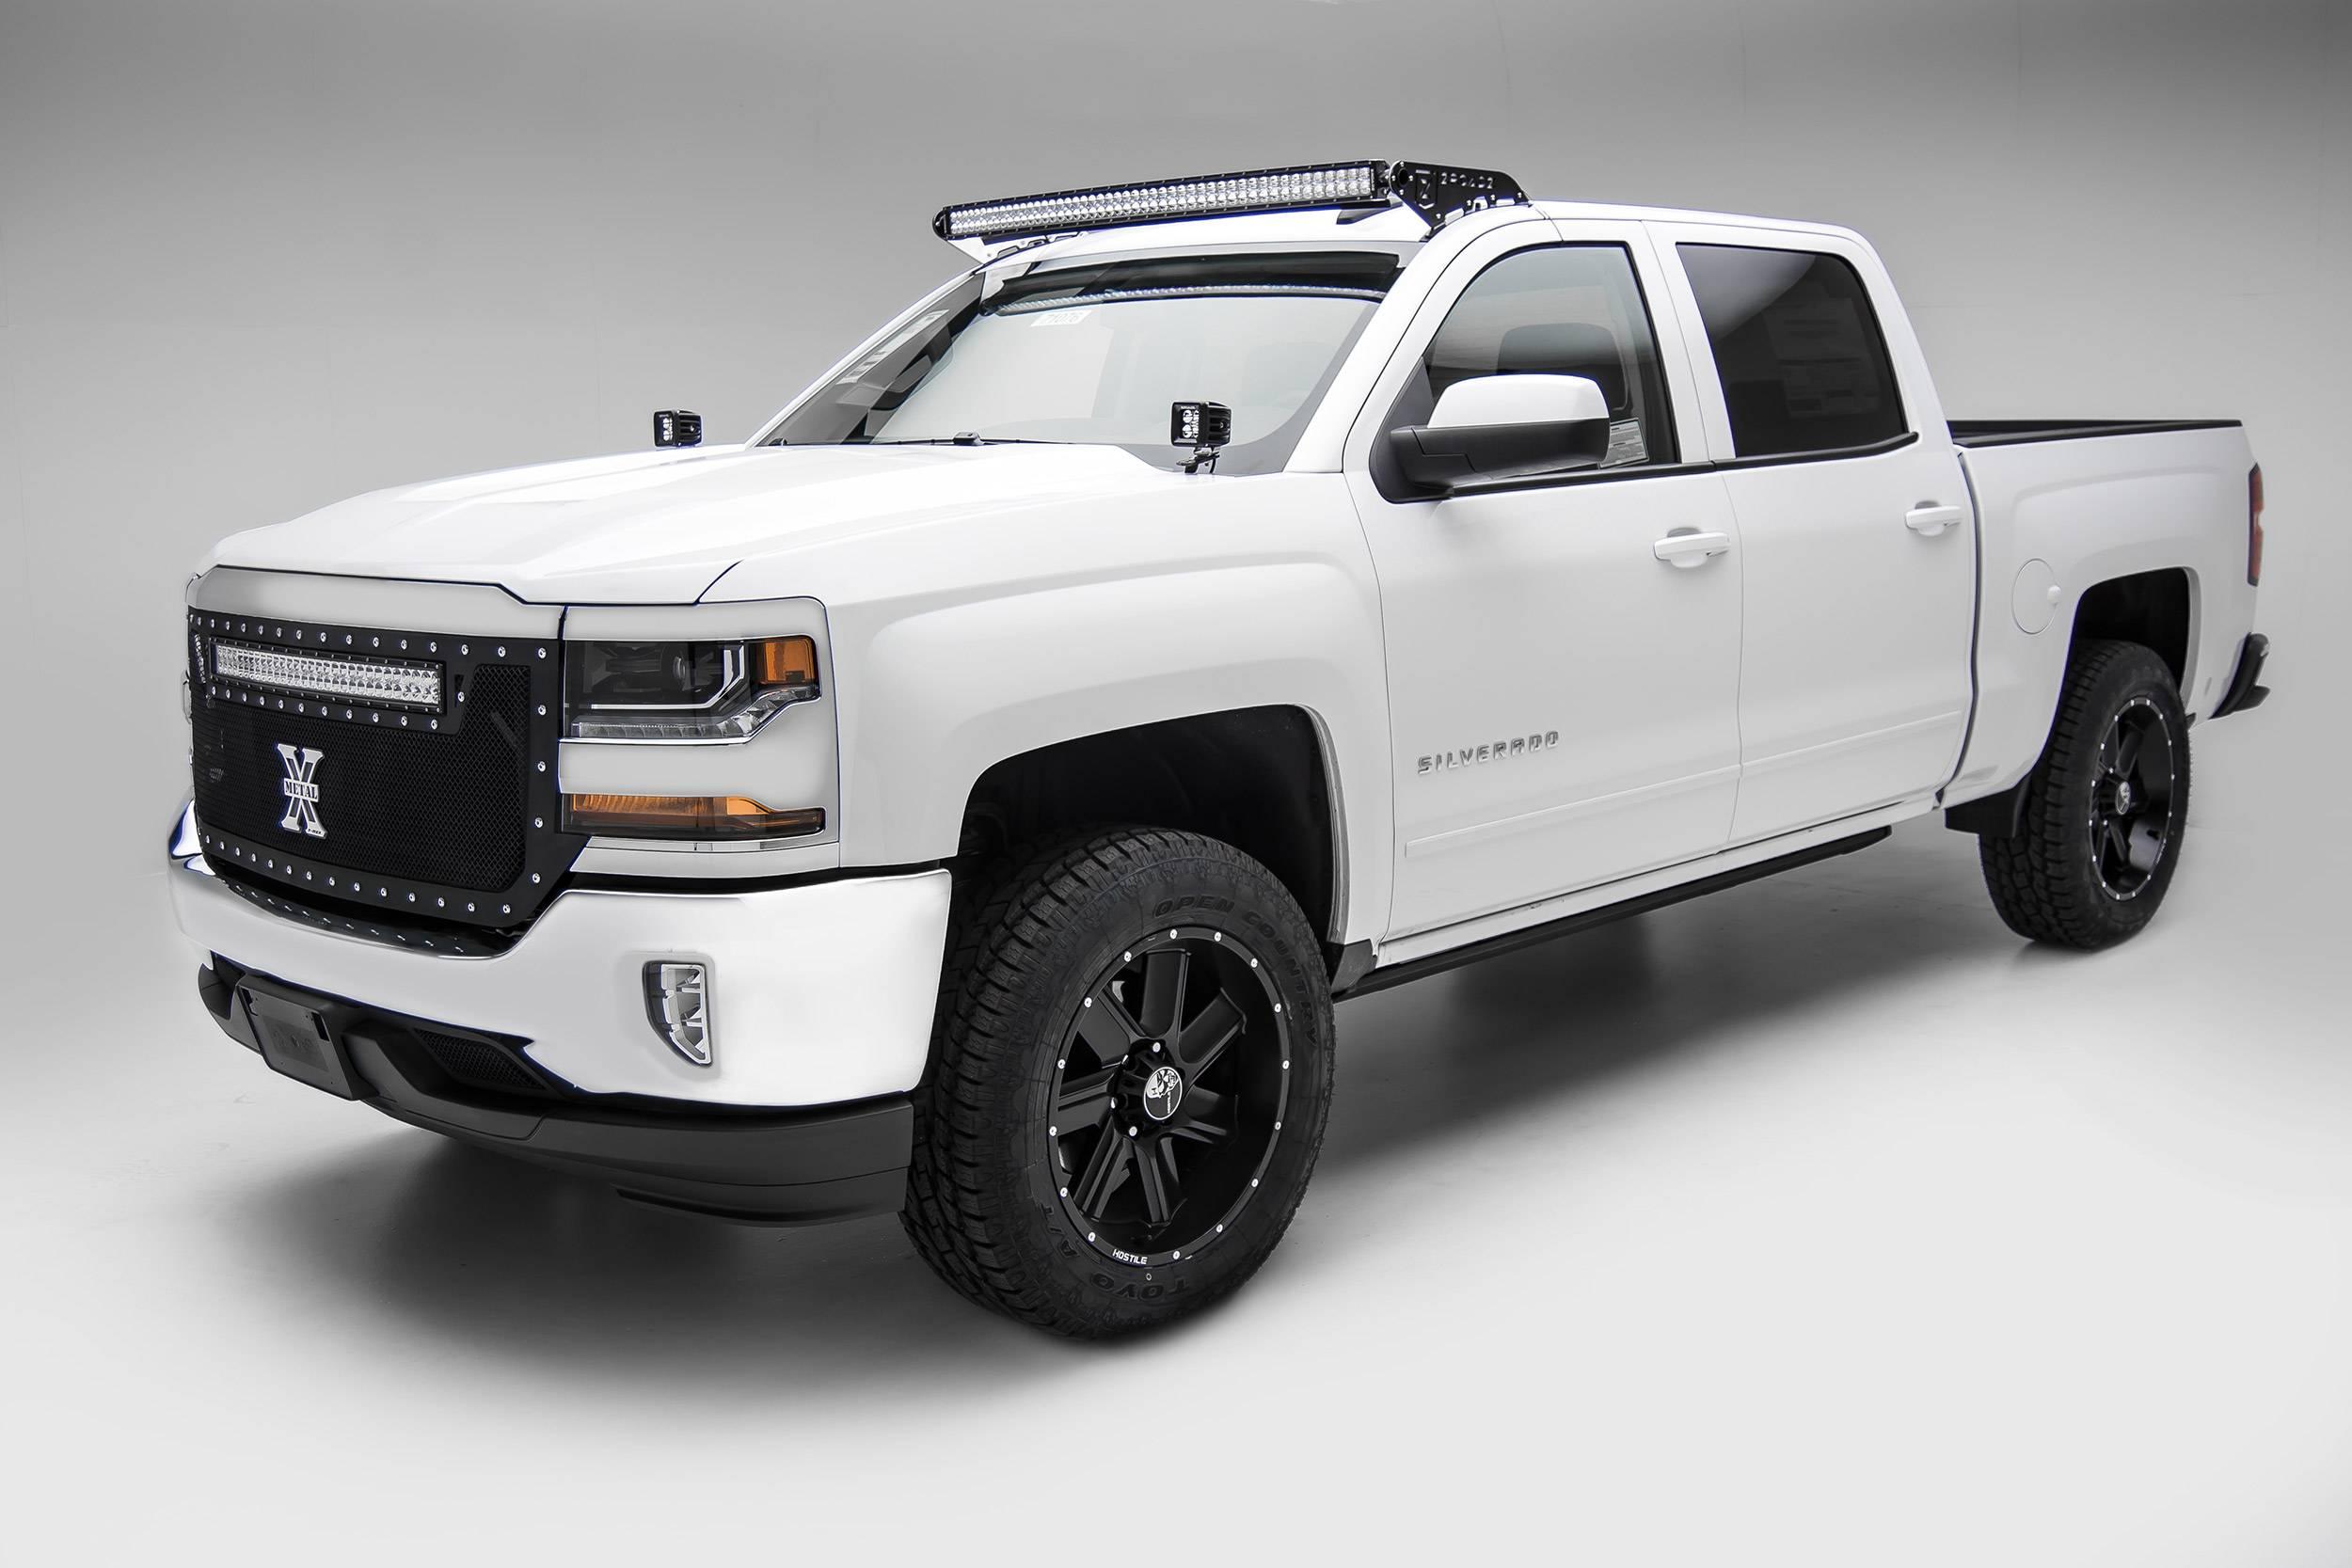 ZROADZ                                             - Silverado, Sierra Front Roof LED Bracket to mount 50 Inch Curved LED Light Bar - PN #Z332281